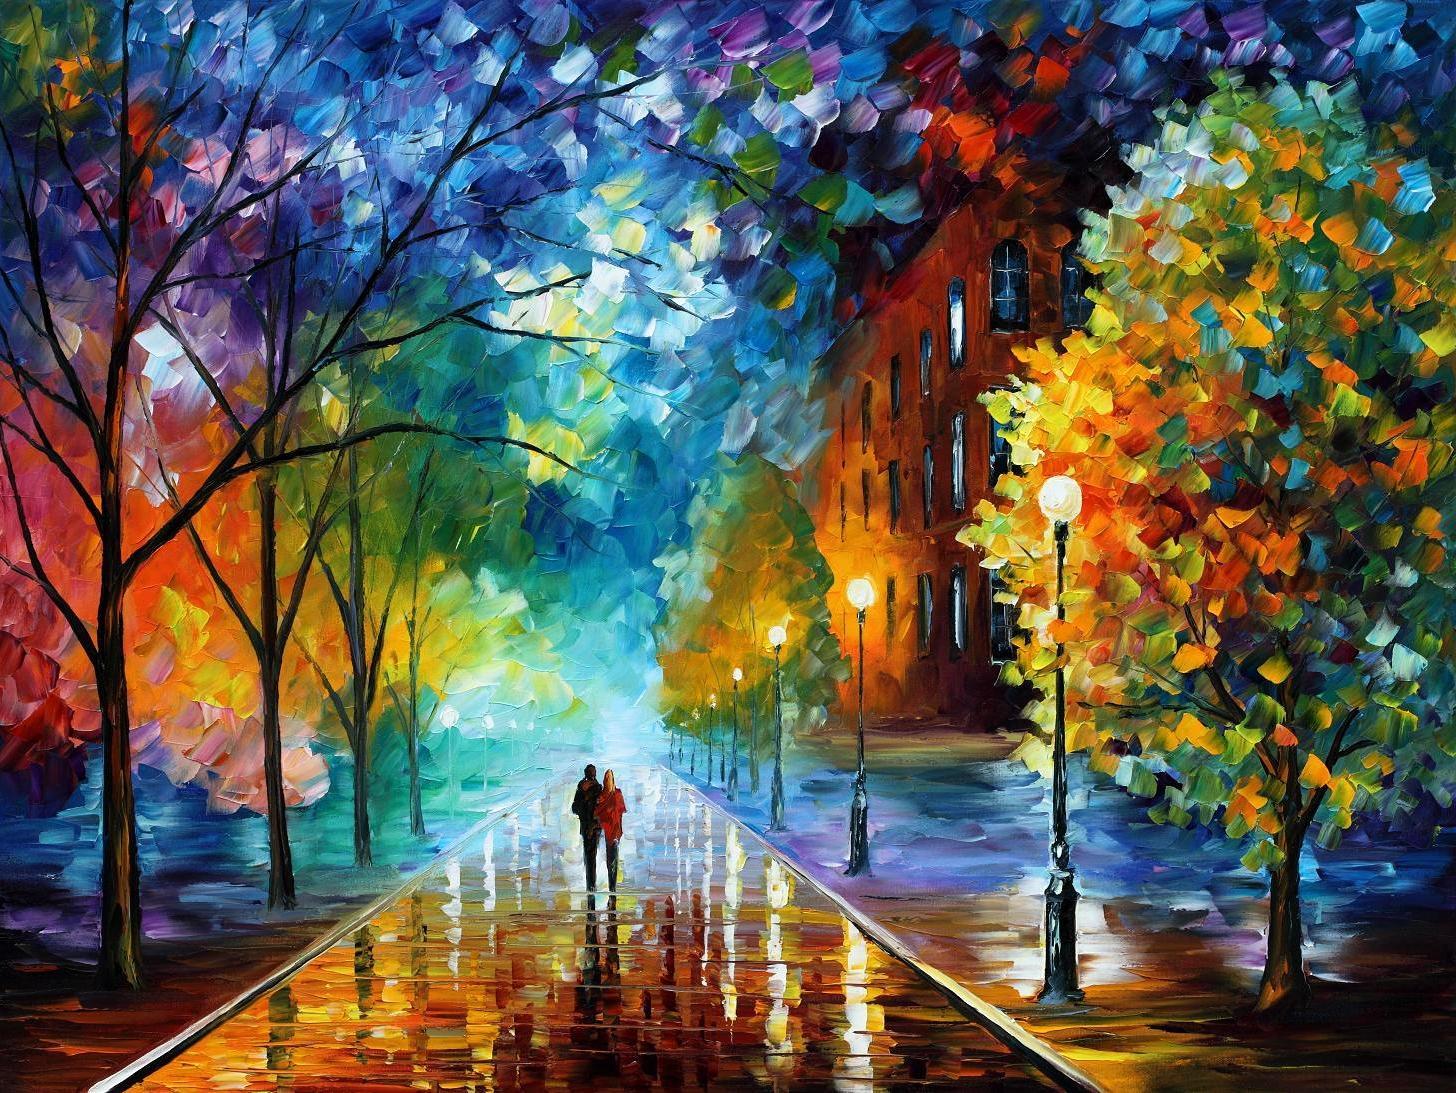 http://2.bp.blogspot.com/-Mn3mbtjY0_I/UTdNYlkJMpI/AAAAAAAAAhA/icQeiE6G6HM/s1600/paintings_leonid_afremov_desktop_1456x1093_wallpaper-408036.jpg